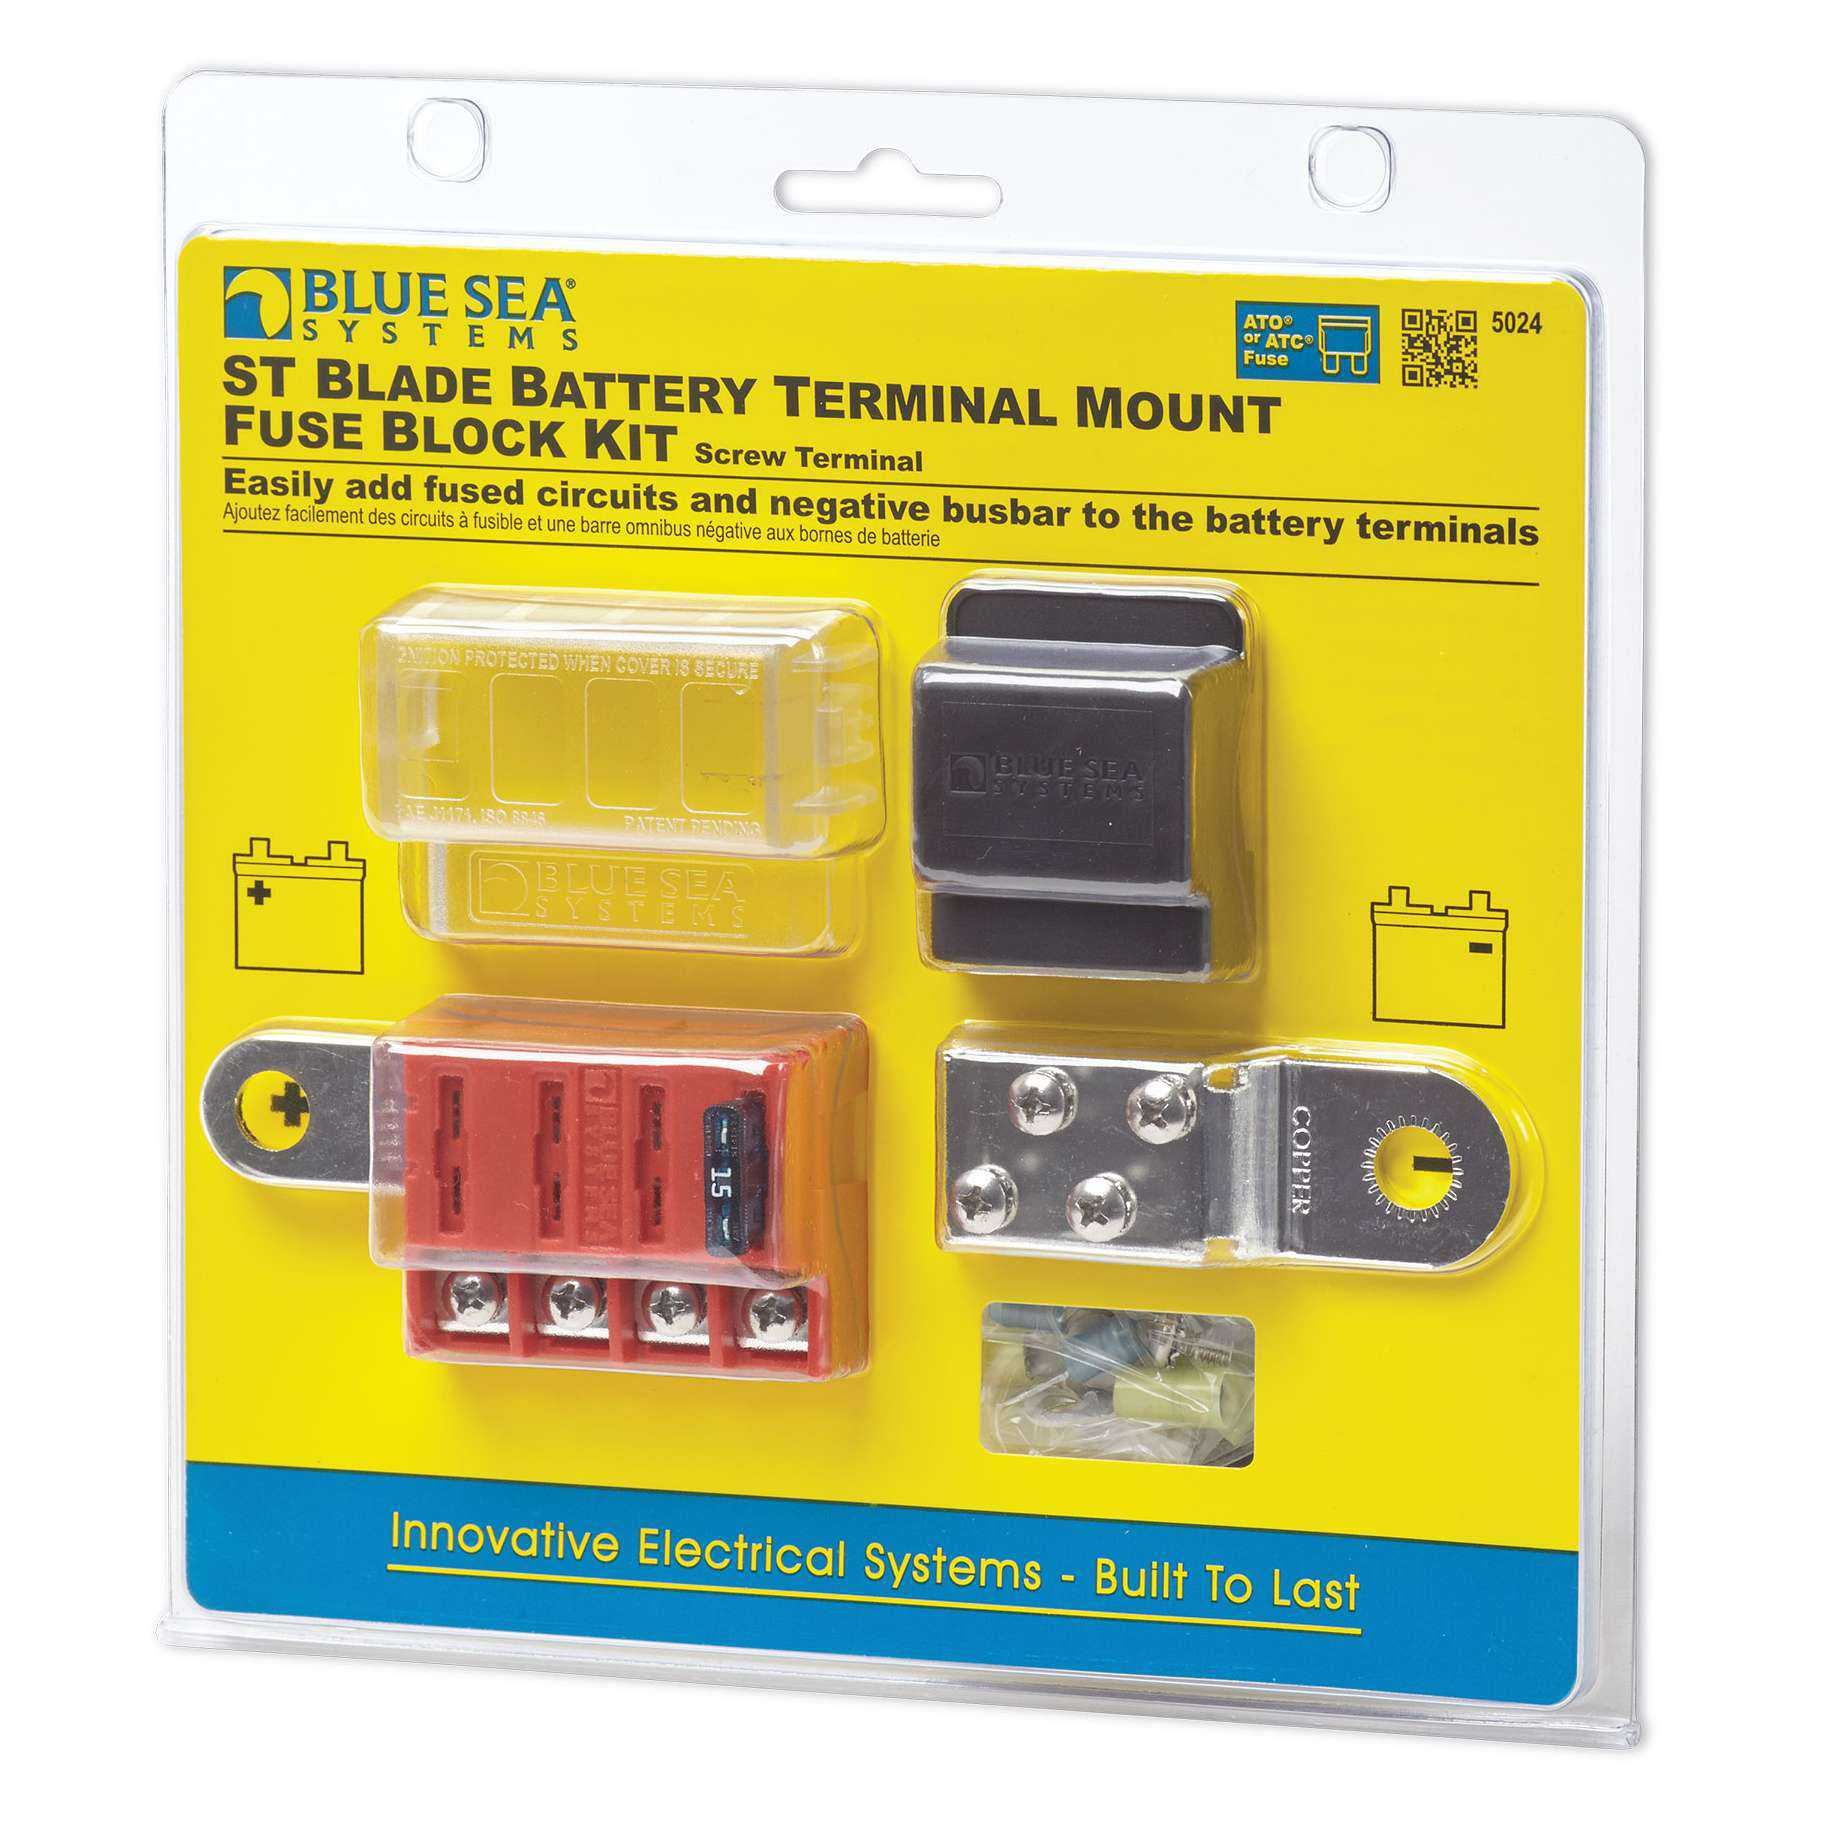 Blue Sea 40 Marine ST Blade Battery Terminal Mount Fuse Block ...